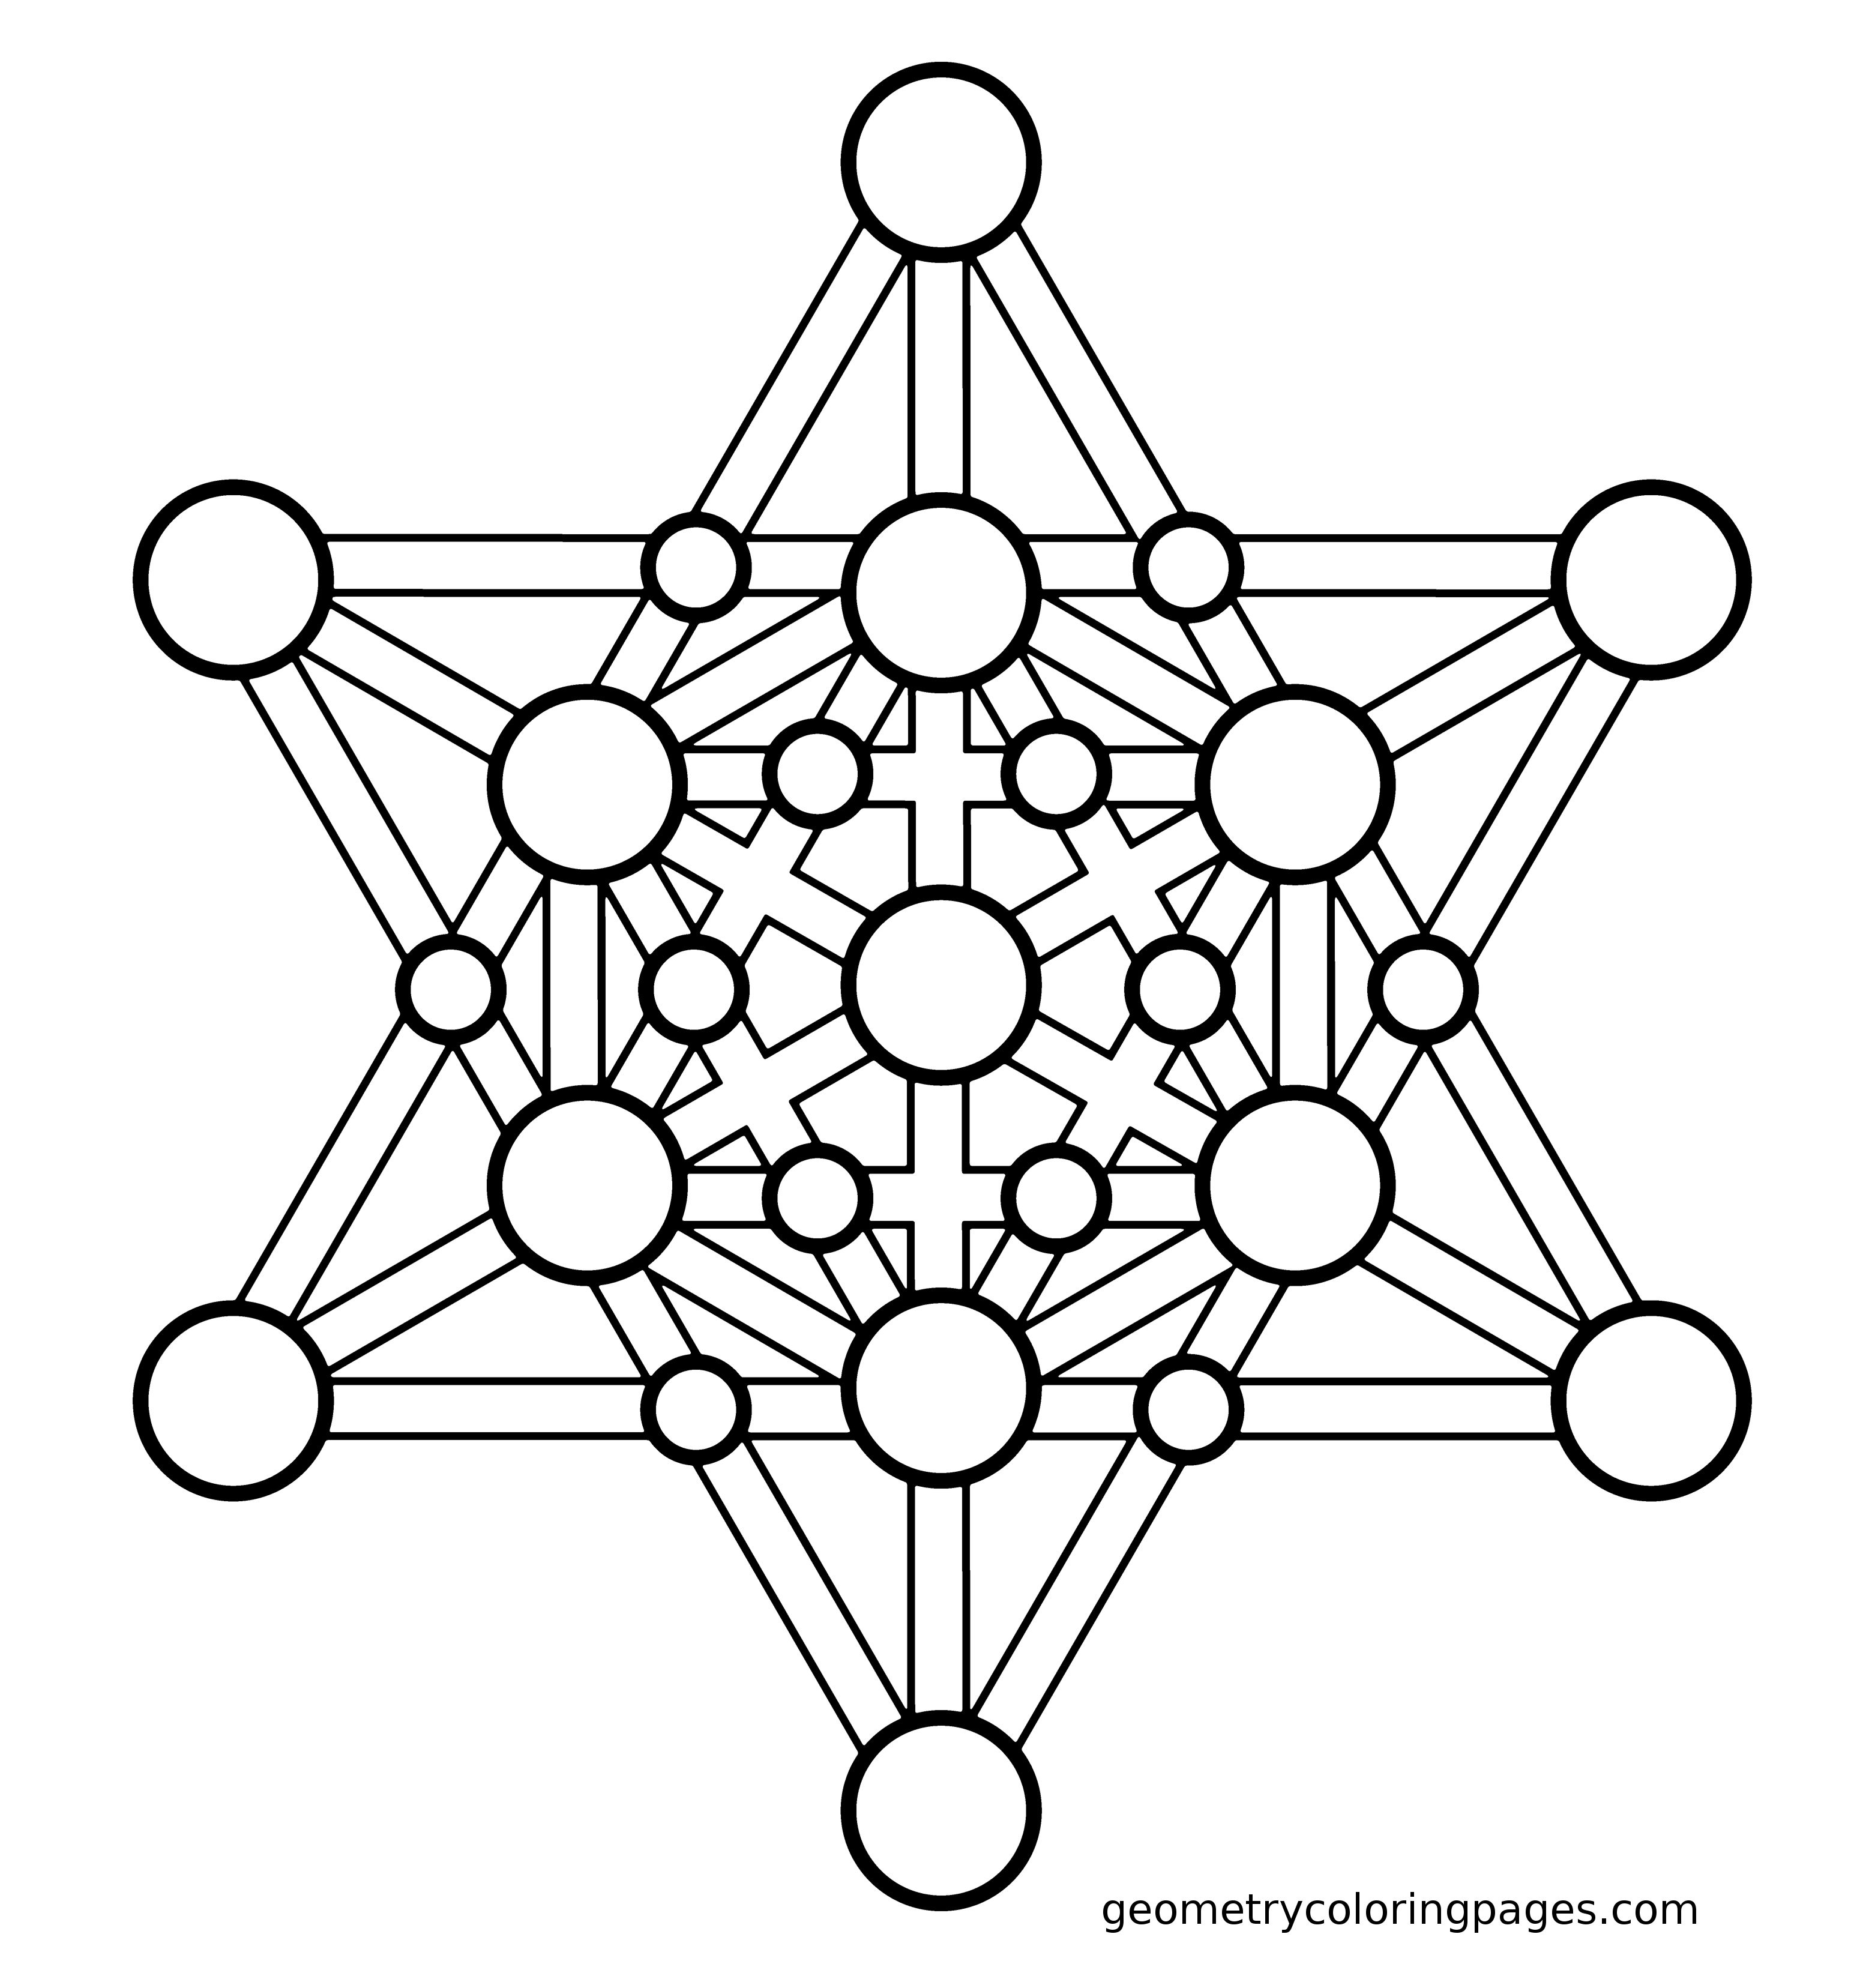 Merkaba Geometry Coloring Pages Sacred Geometry Mandala Coloring Pages Coloring Pages